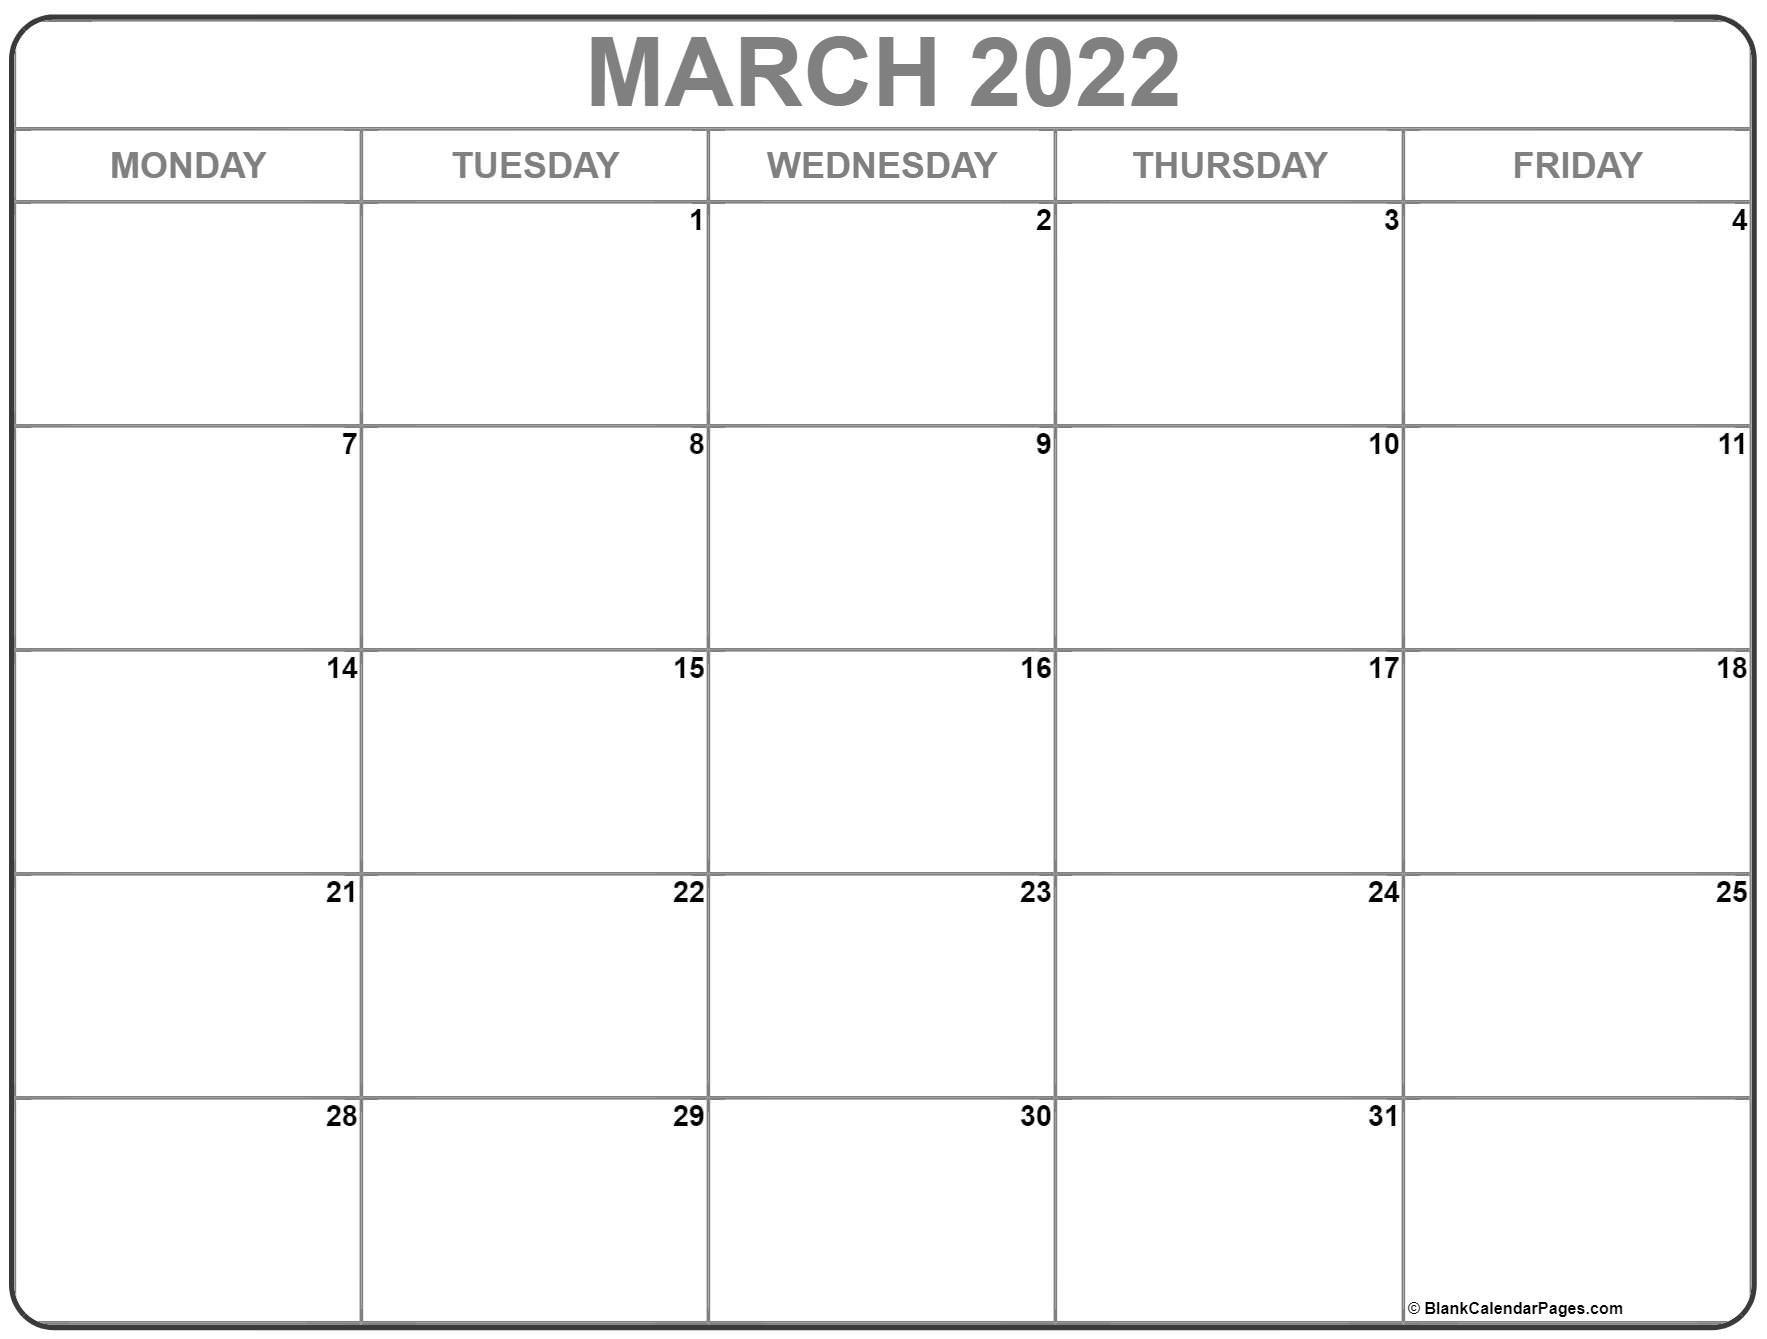 March 2022 Monday Calendar | Monday To Sunday Printable Monday Through Friday Monthly Calendar Free